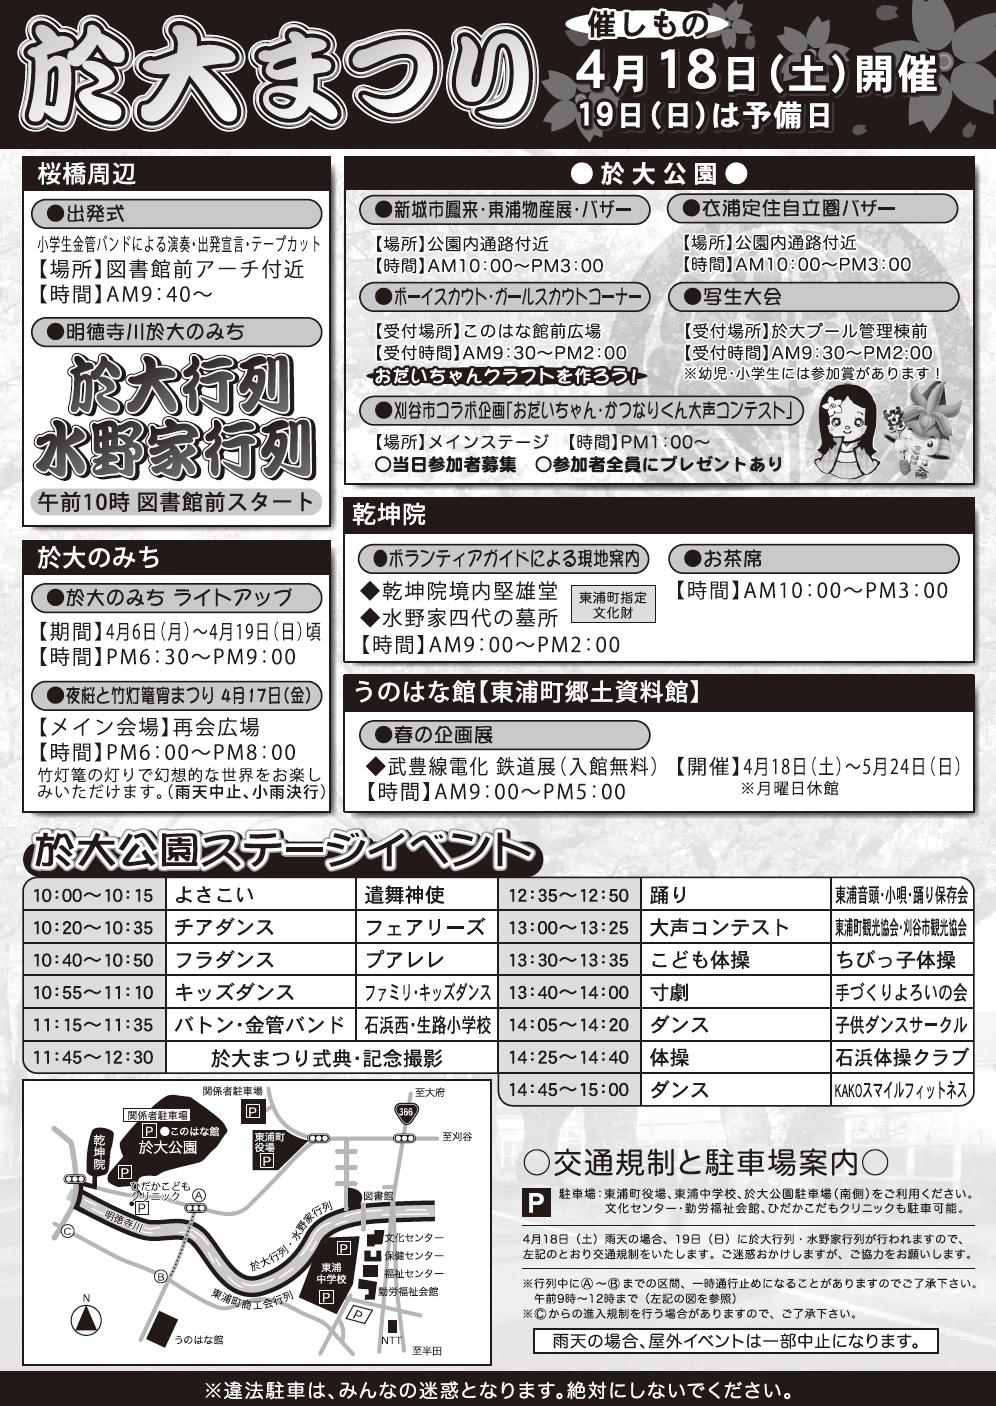 22th_odaimatsuri20150418b